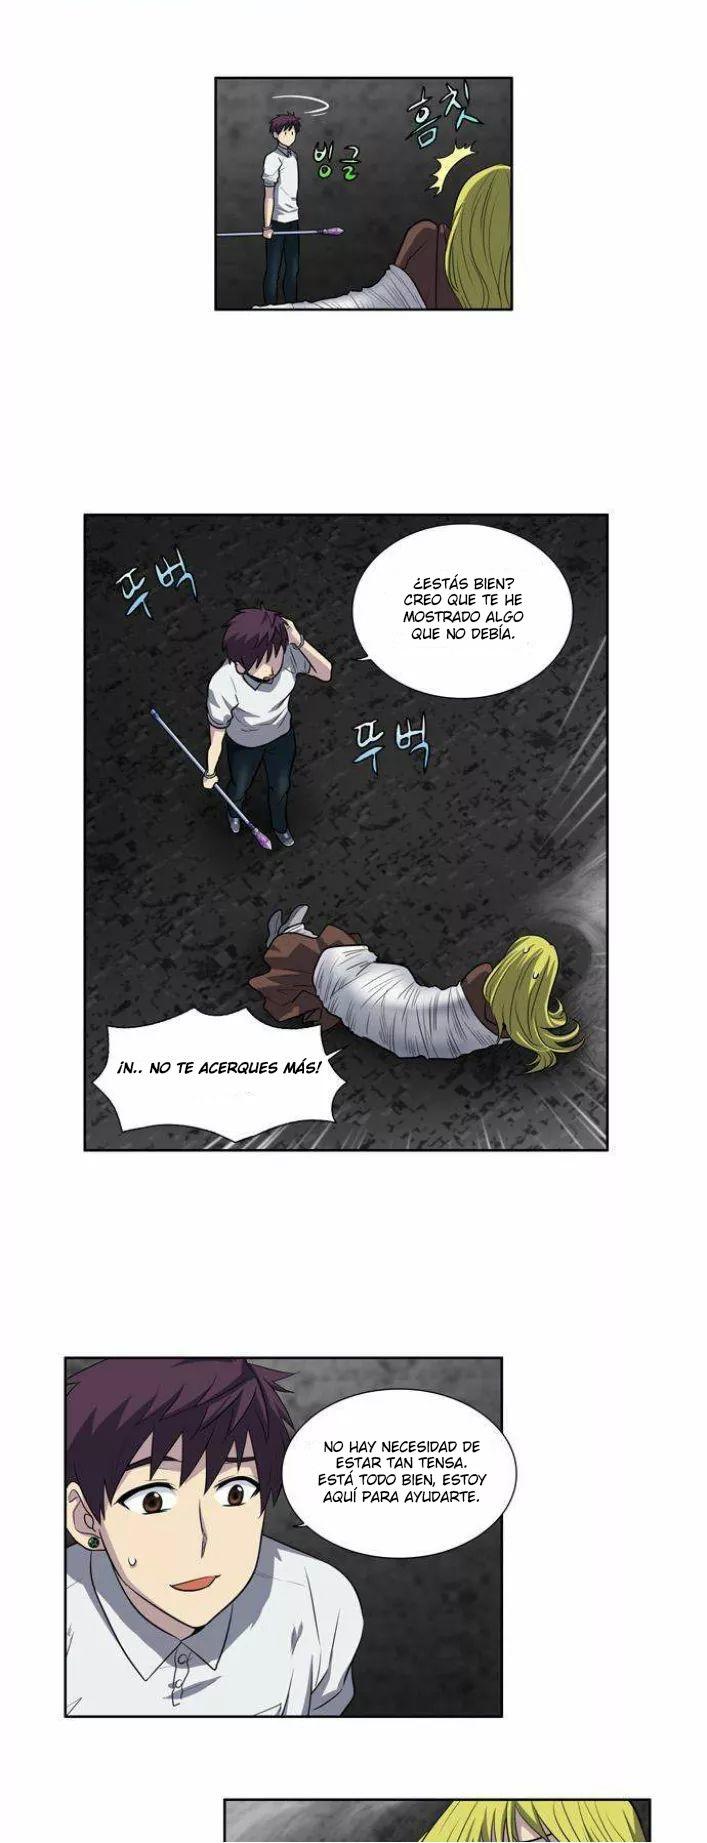 https://c5.ninemanga.com/es_manga/61/1725/484924/7244e80f78fd5664f0f38f37815be3fa.jpg Page 4